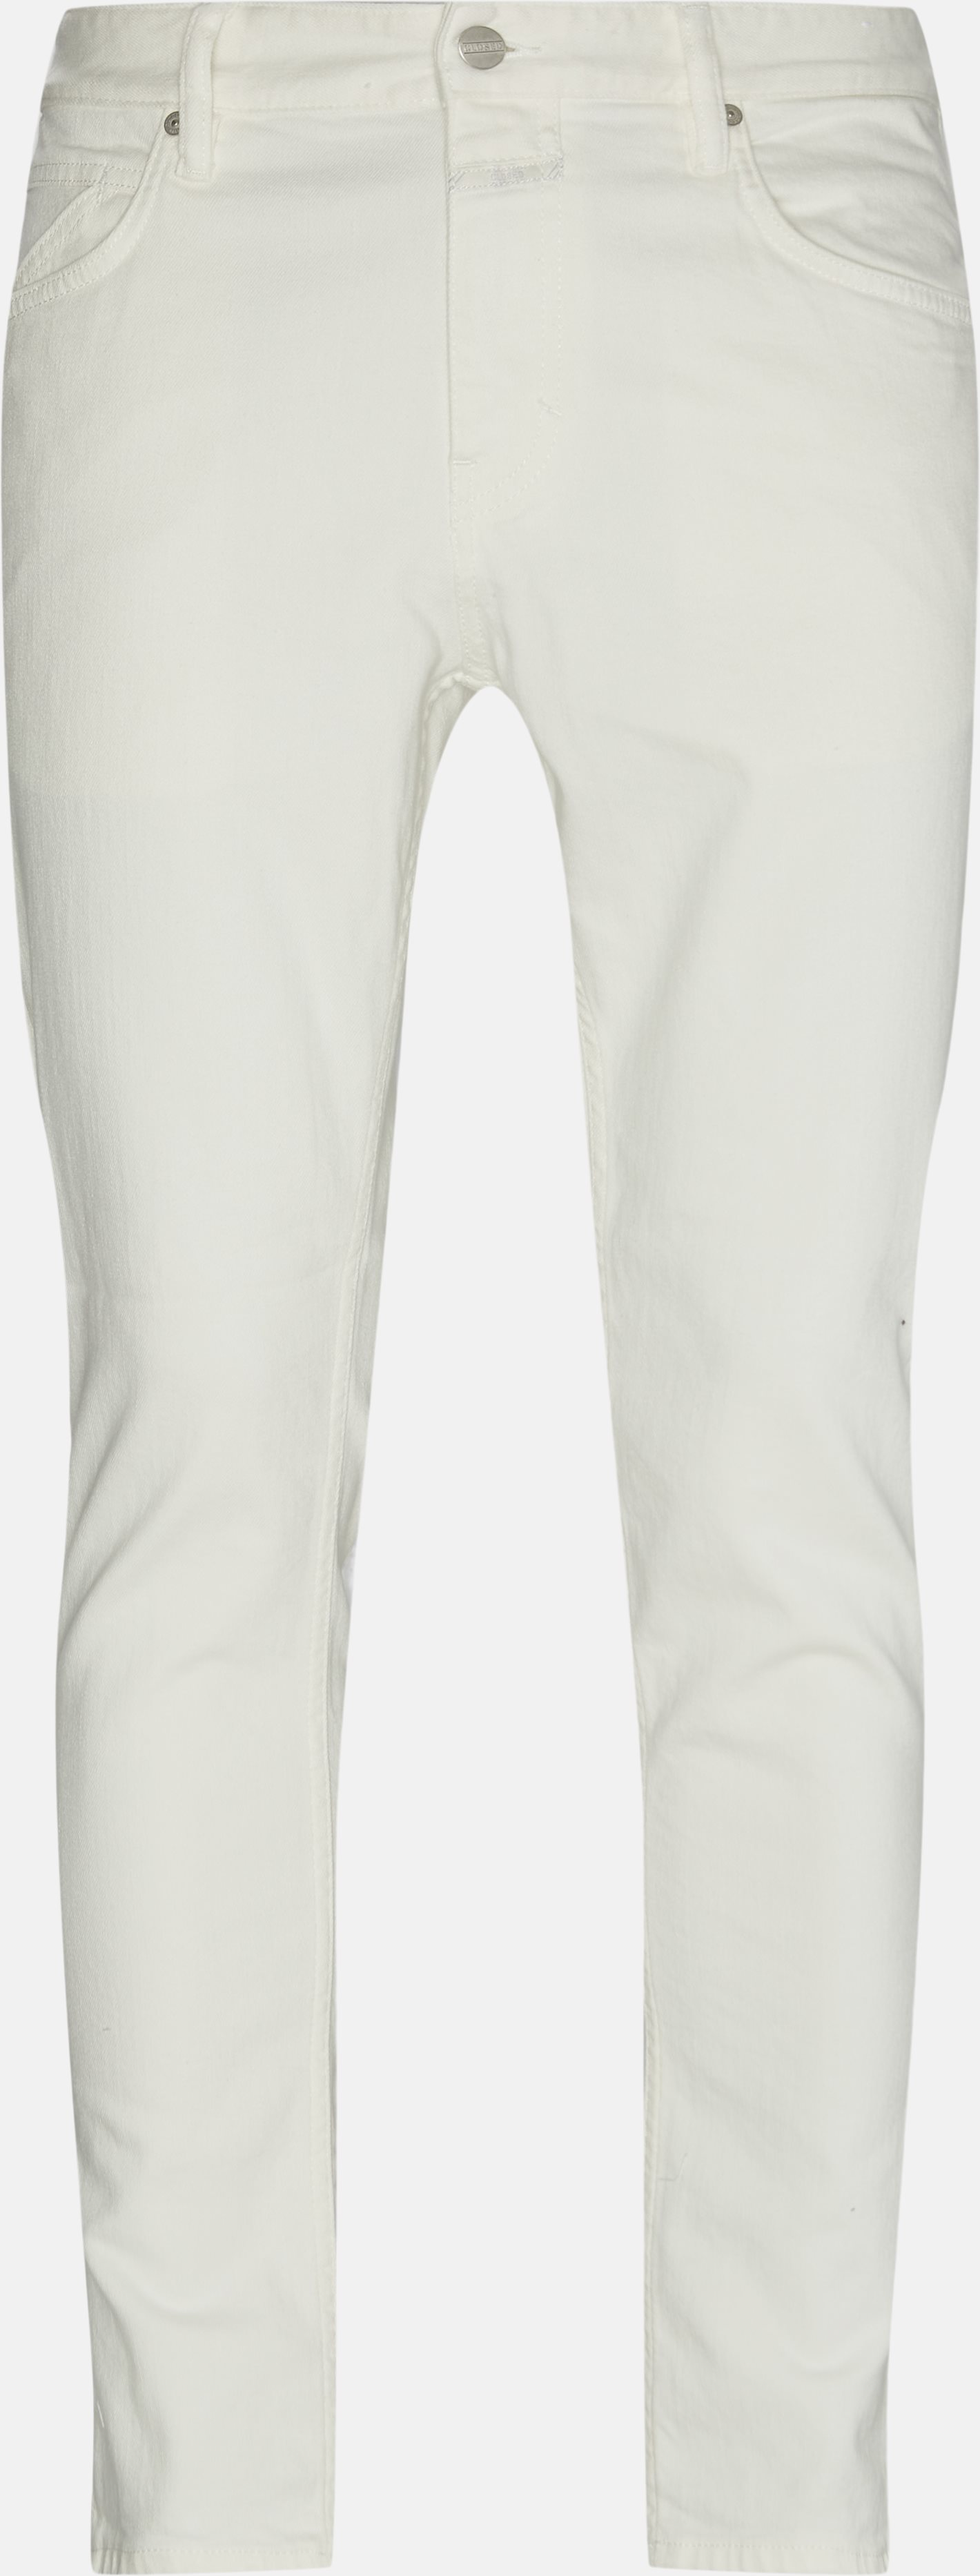 Jeans - Slim - Hvid